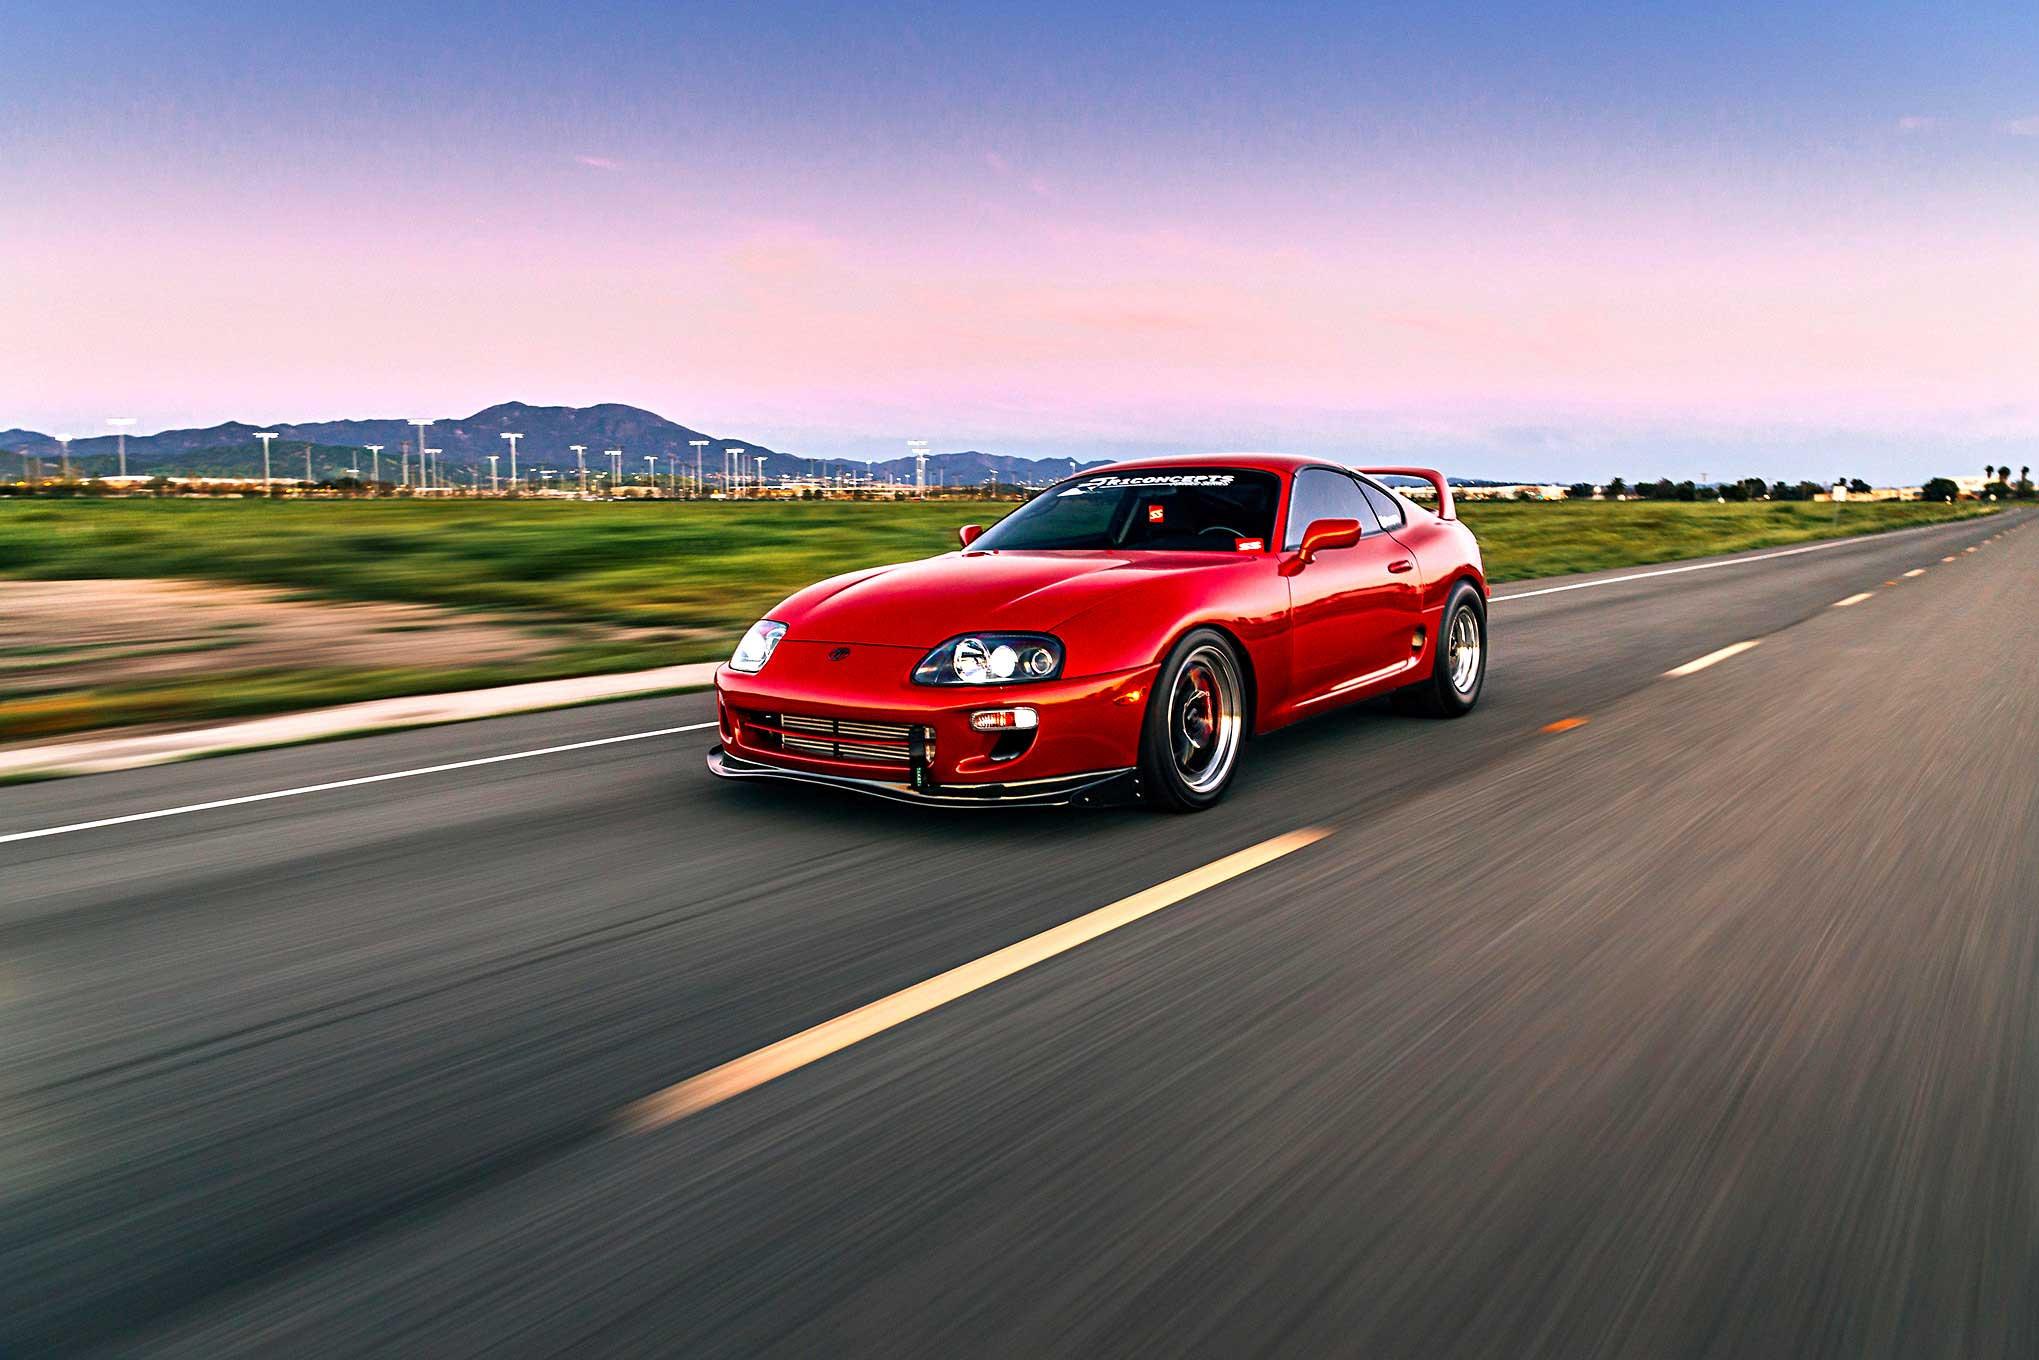 Kelebihan Kekurangan Toyota Supra 2001 Top Model Tahun Ini